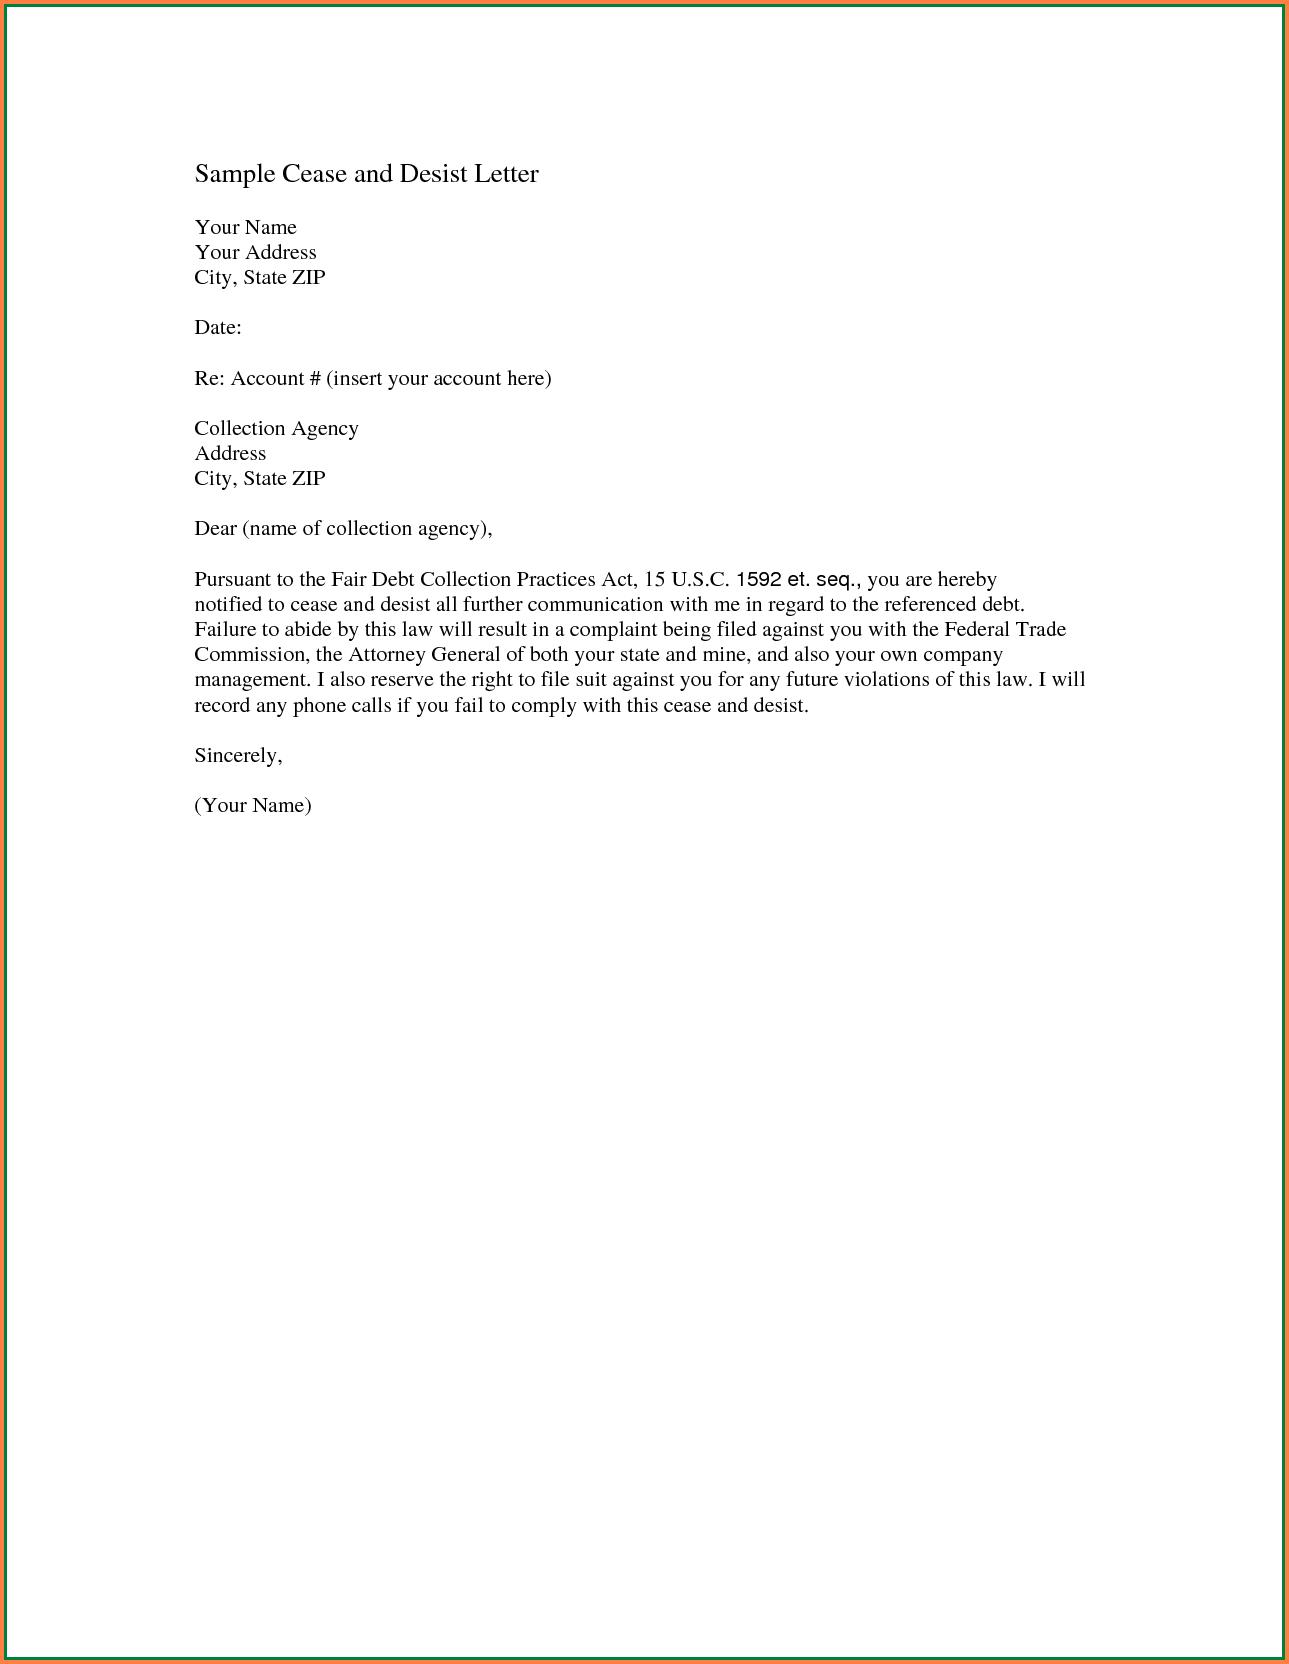 Cease and Desist Slander Letter Template - 20 Best Debt Collection Letter Template Uk Free Graphics